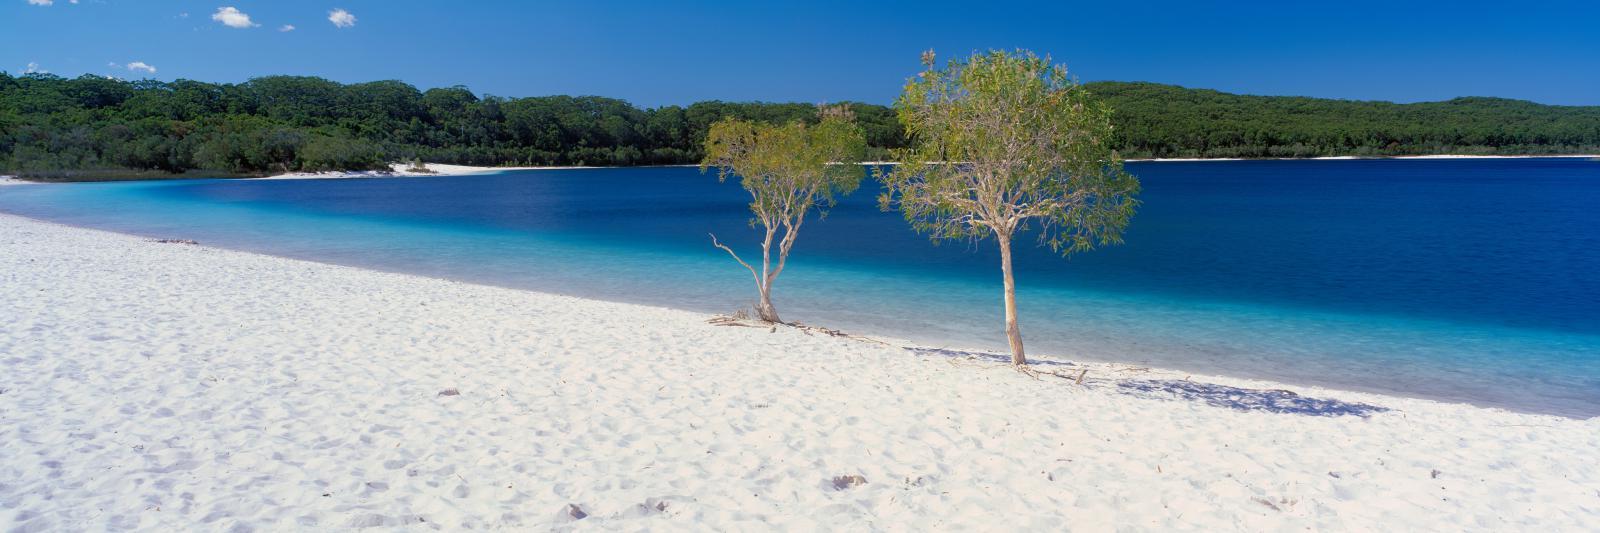 Fraser Island Lake Mckenzie Reise